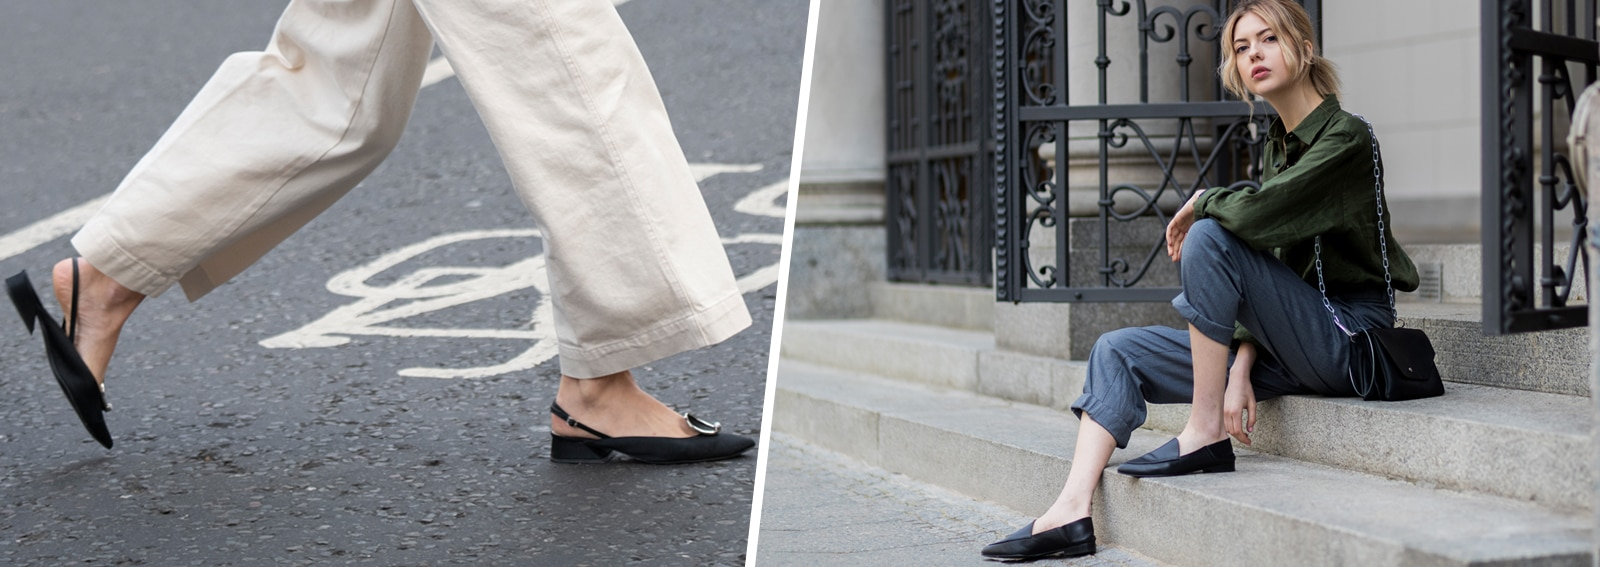 DESKTOP_scarpe_basse